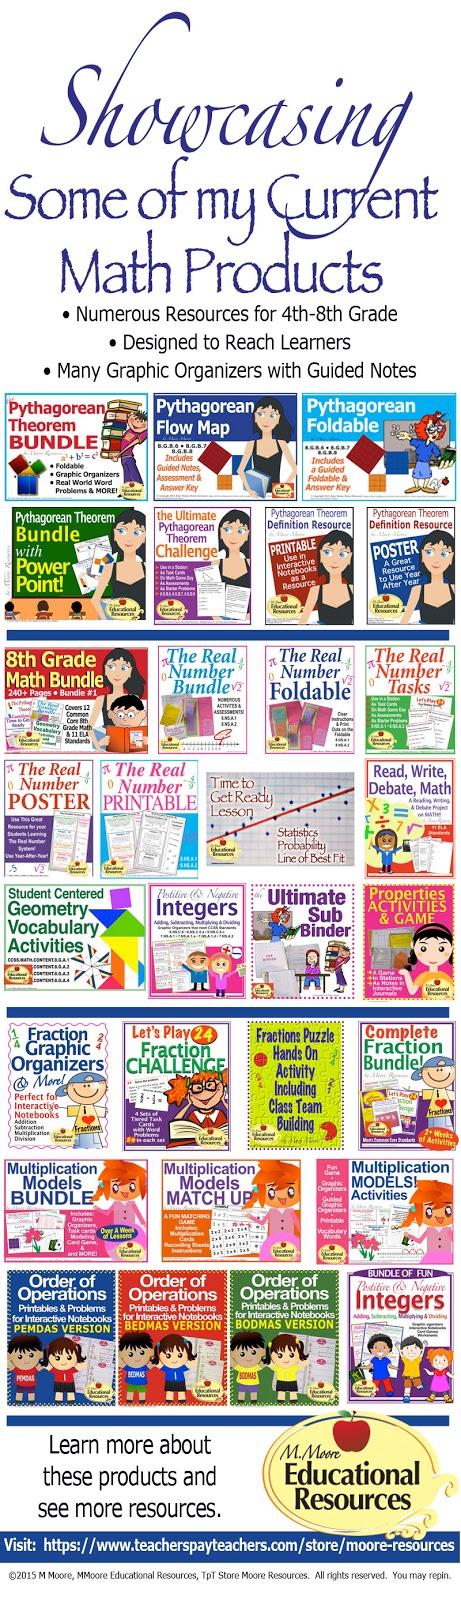 https://www.teacherspayteachers.com/Store/Moore-Resources